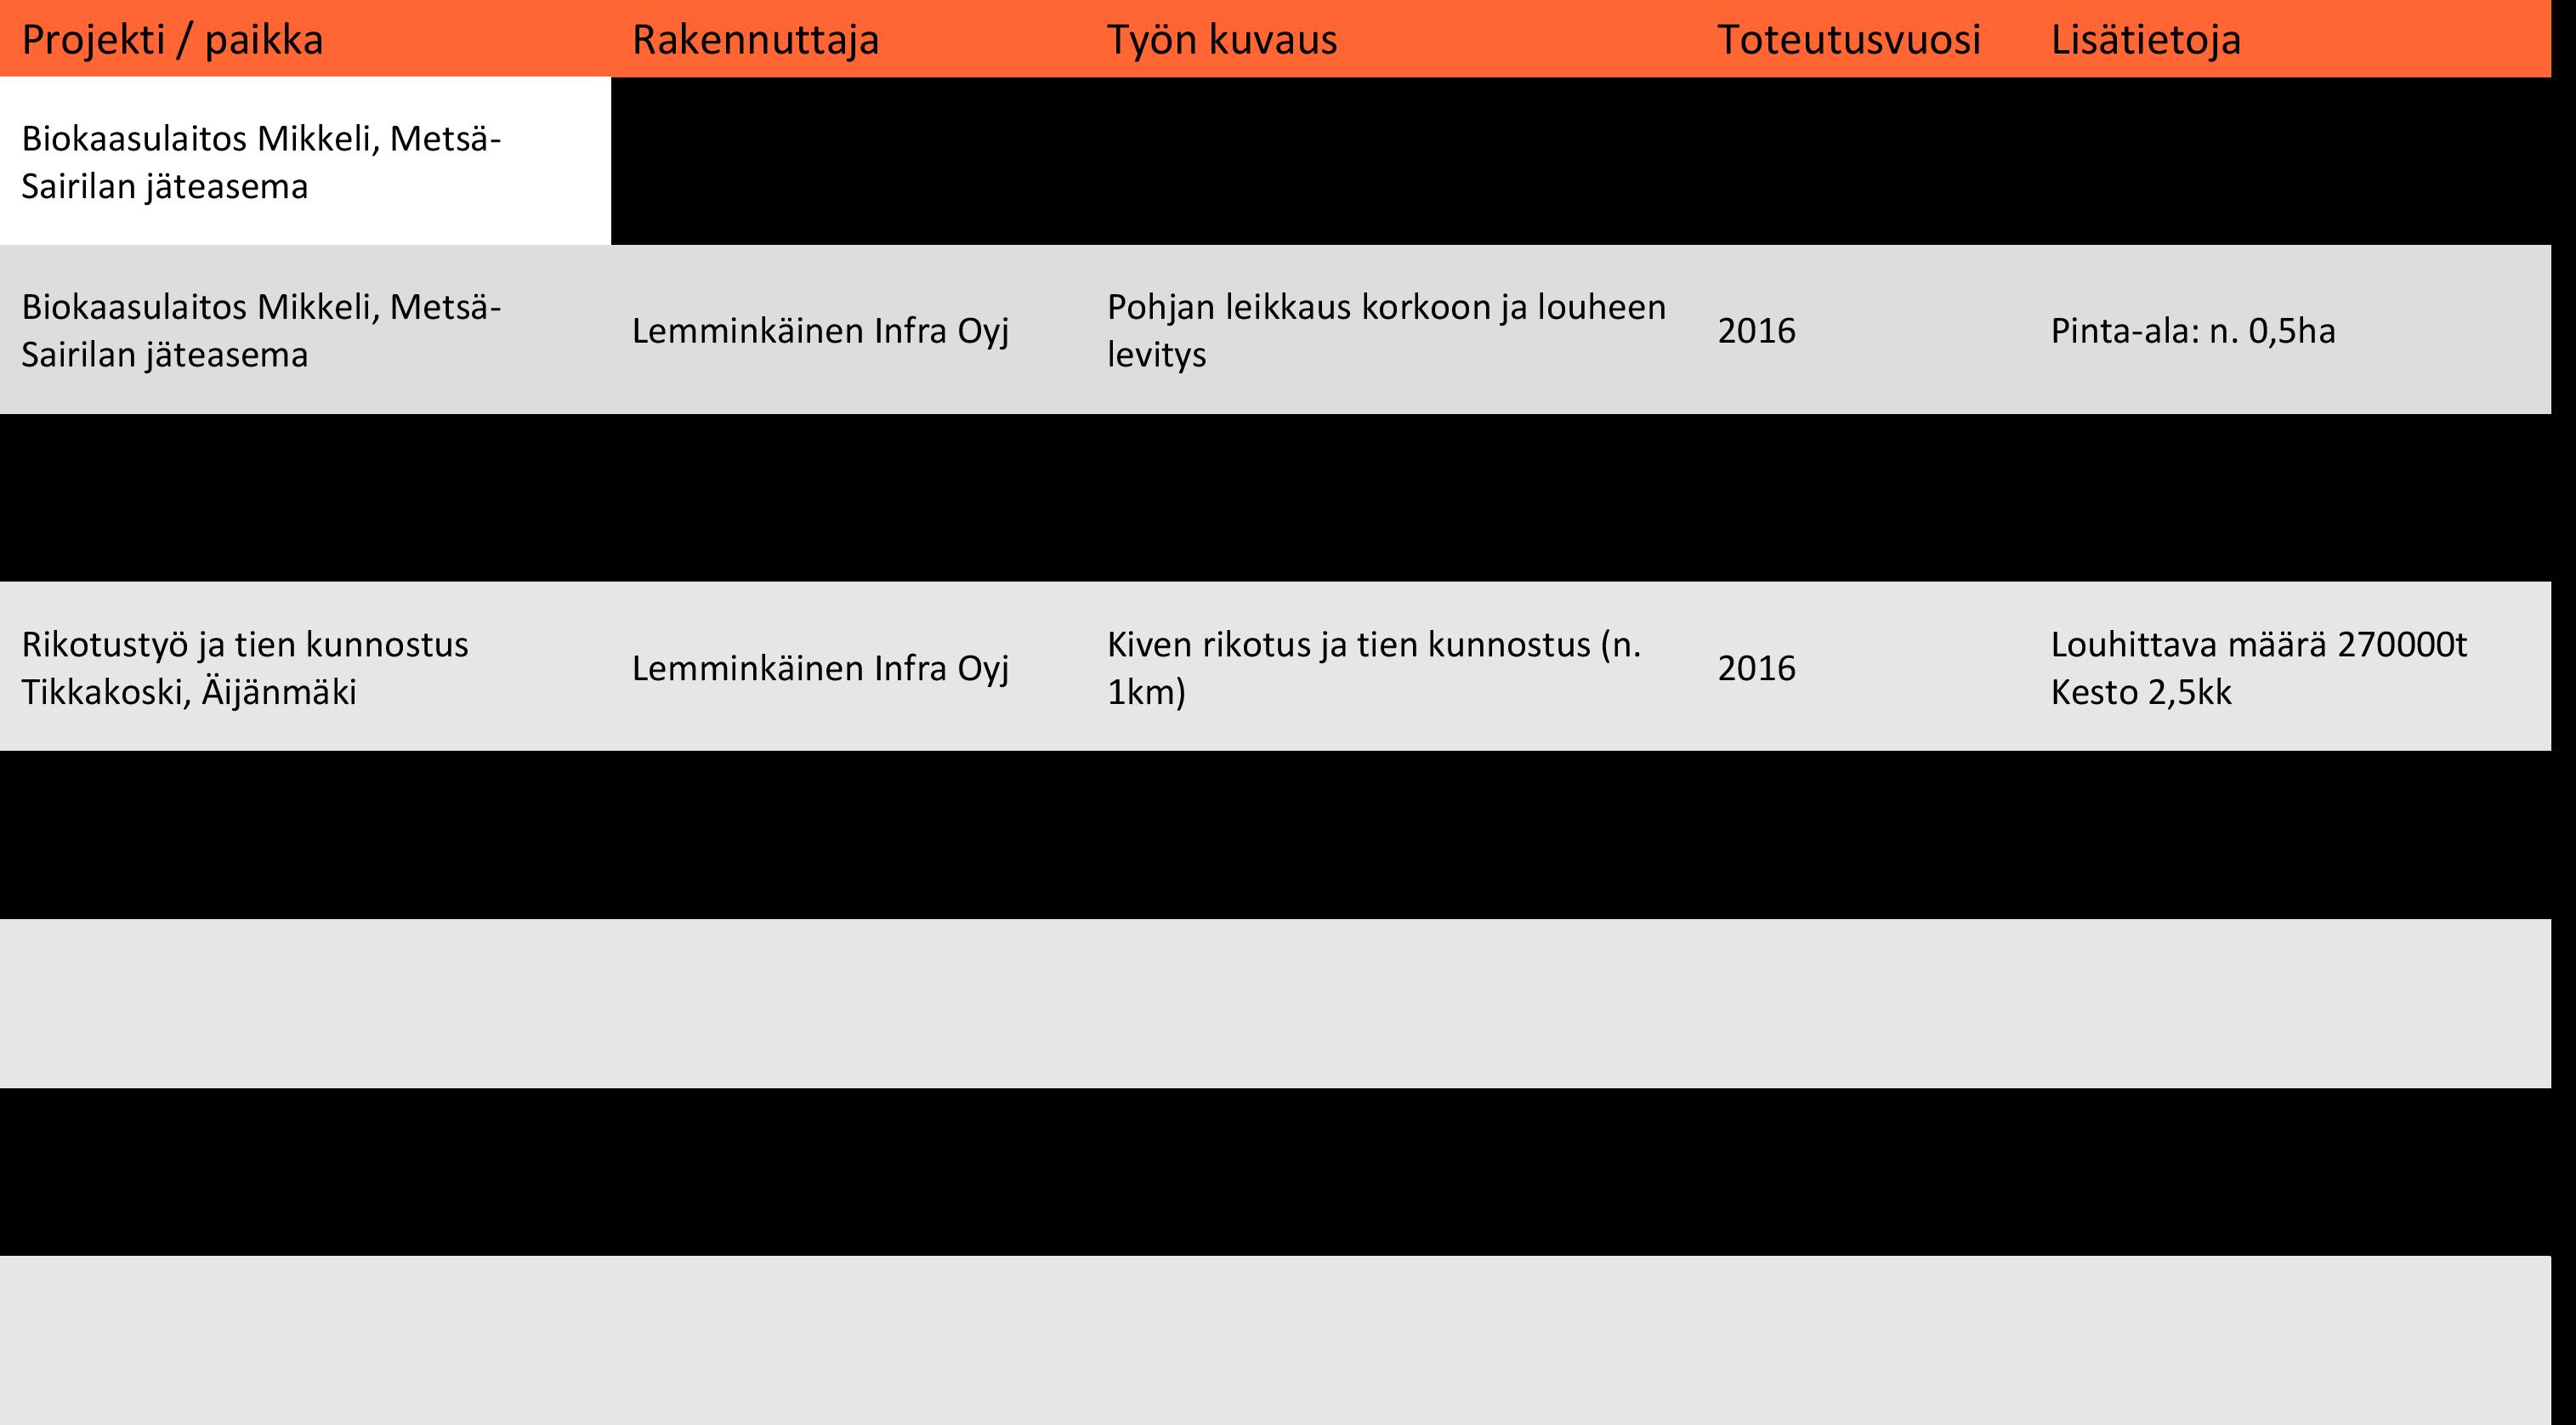 referenssitaulukko_skm